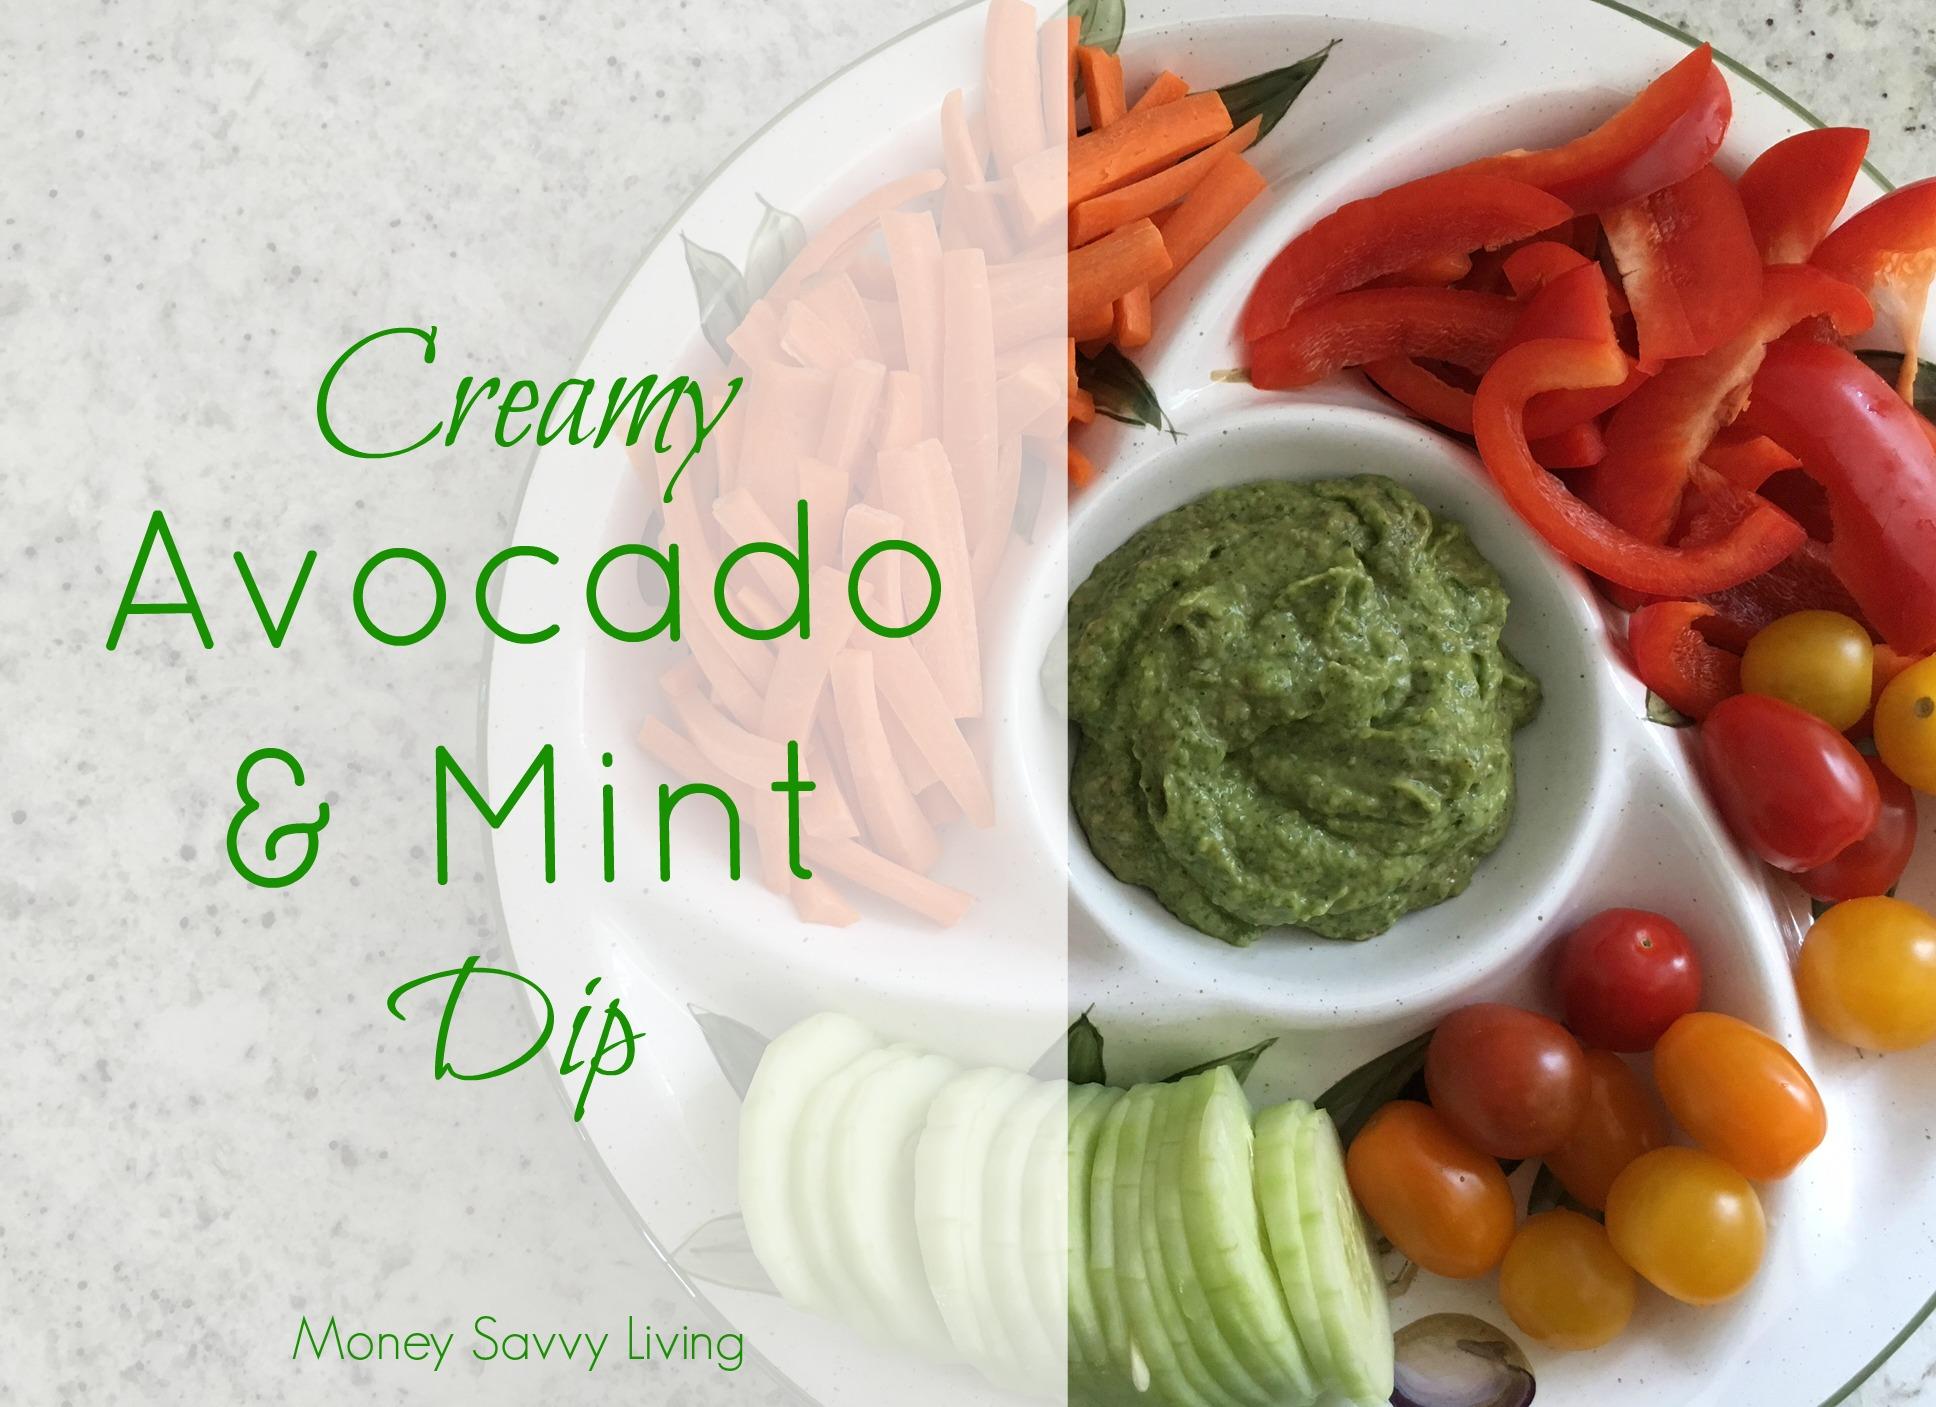 Creamy Avocado & Mint Dip | Money Savvy Living